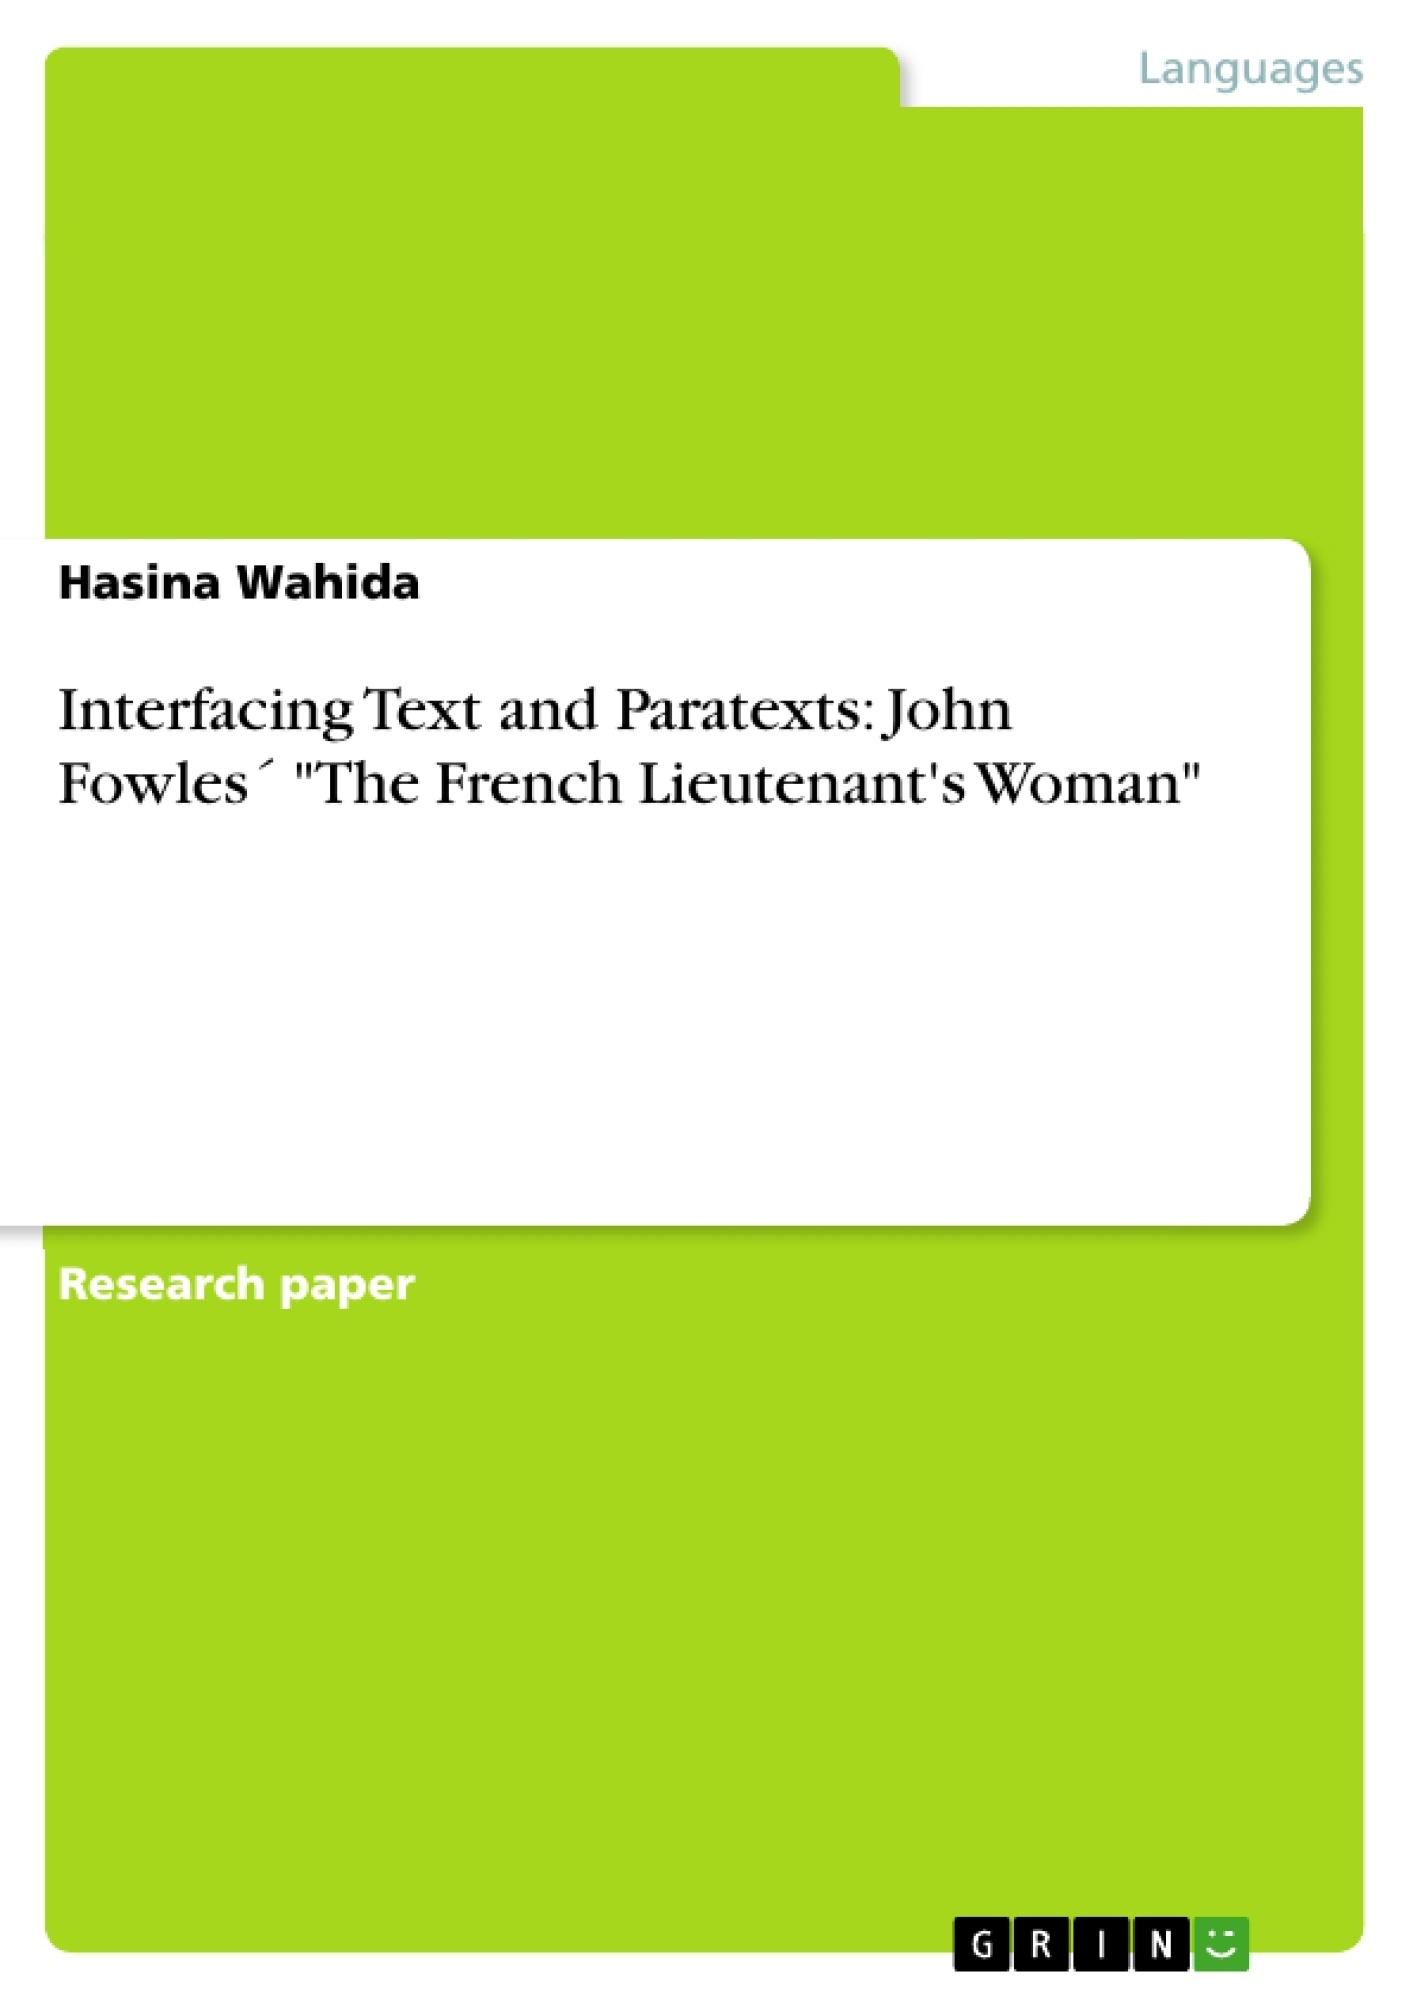 the french lieutenants woman essays